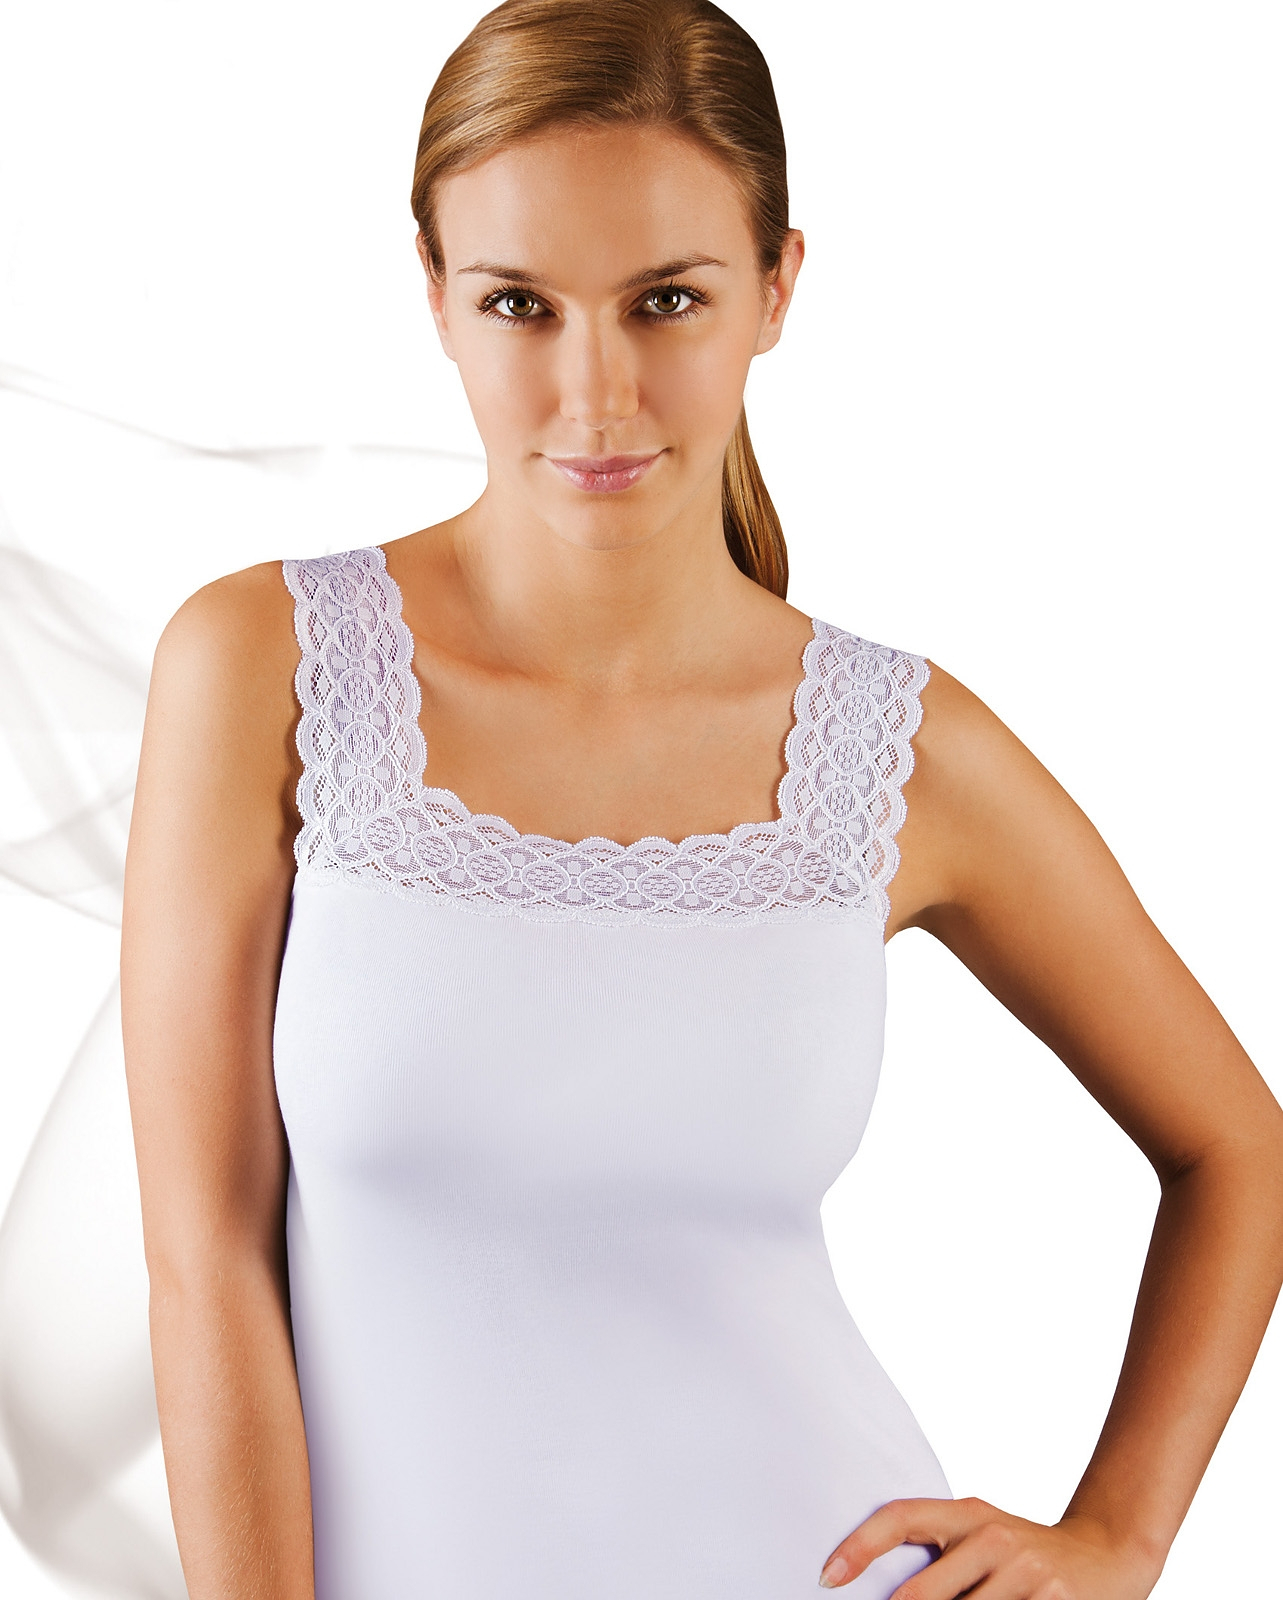 Košilka Emili Asari S-XL Barva: béžová, Velikost: XL